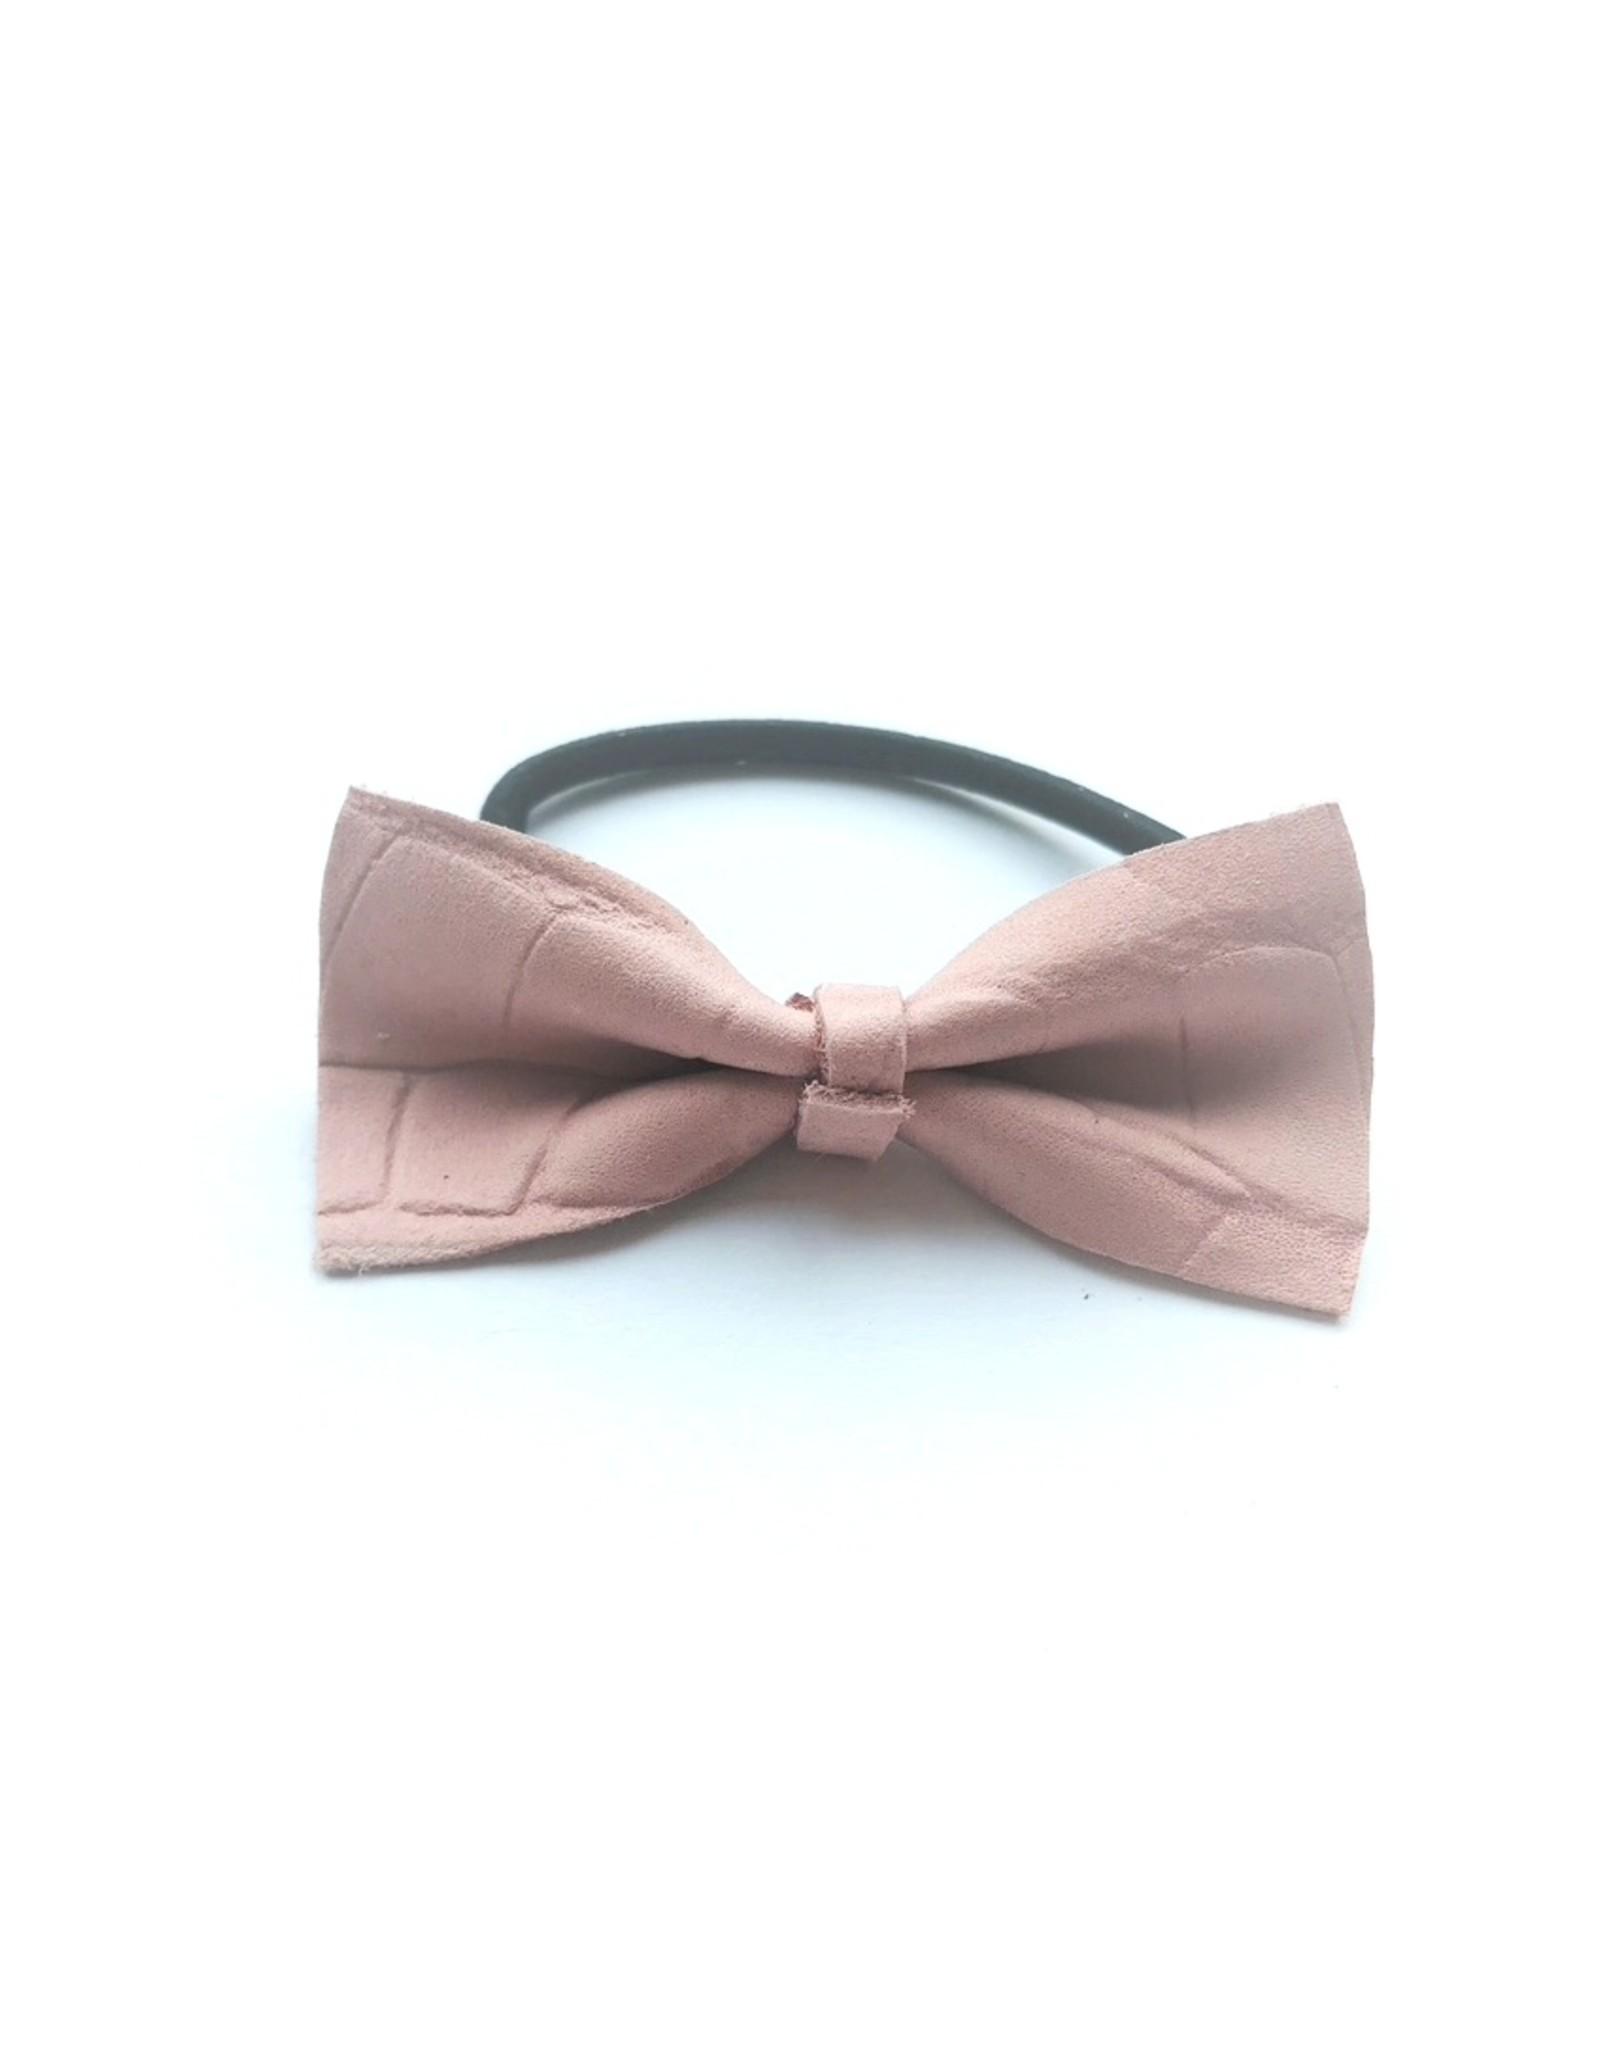 Dutchpanda Haar elastiekje met Roze strikje